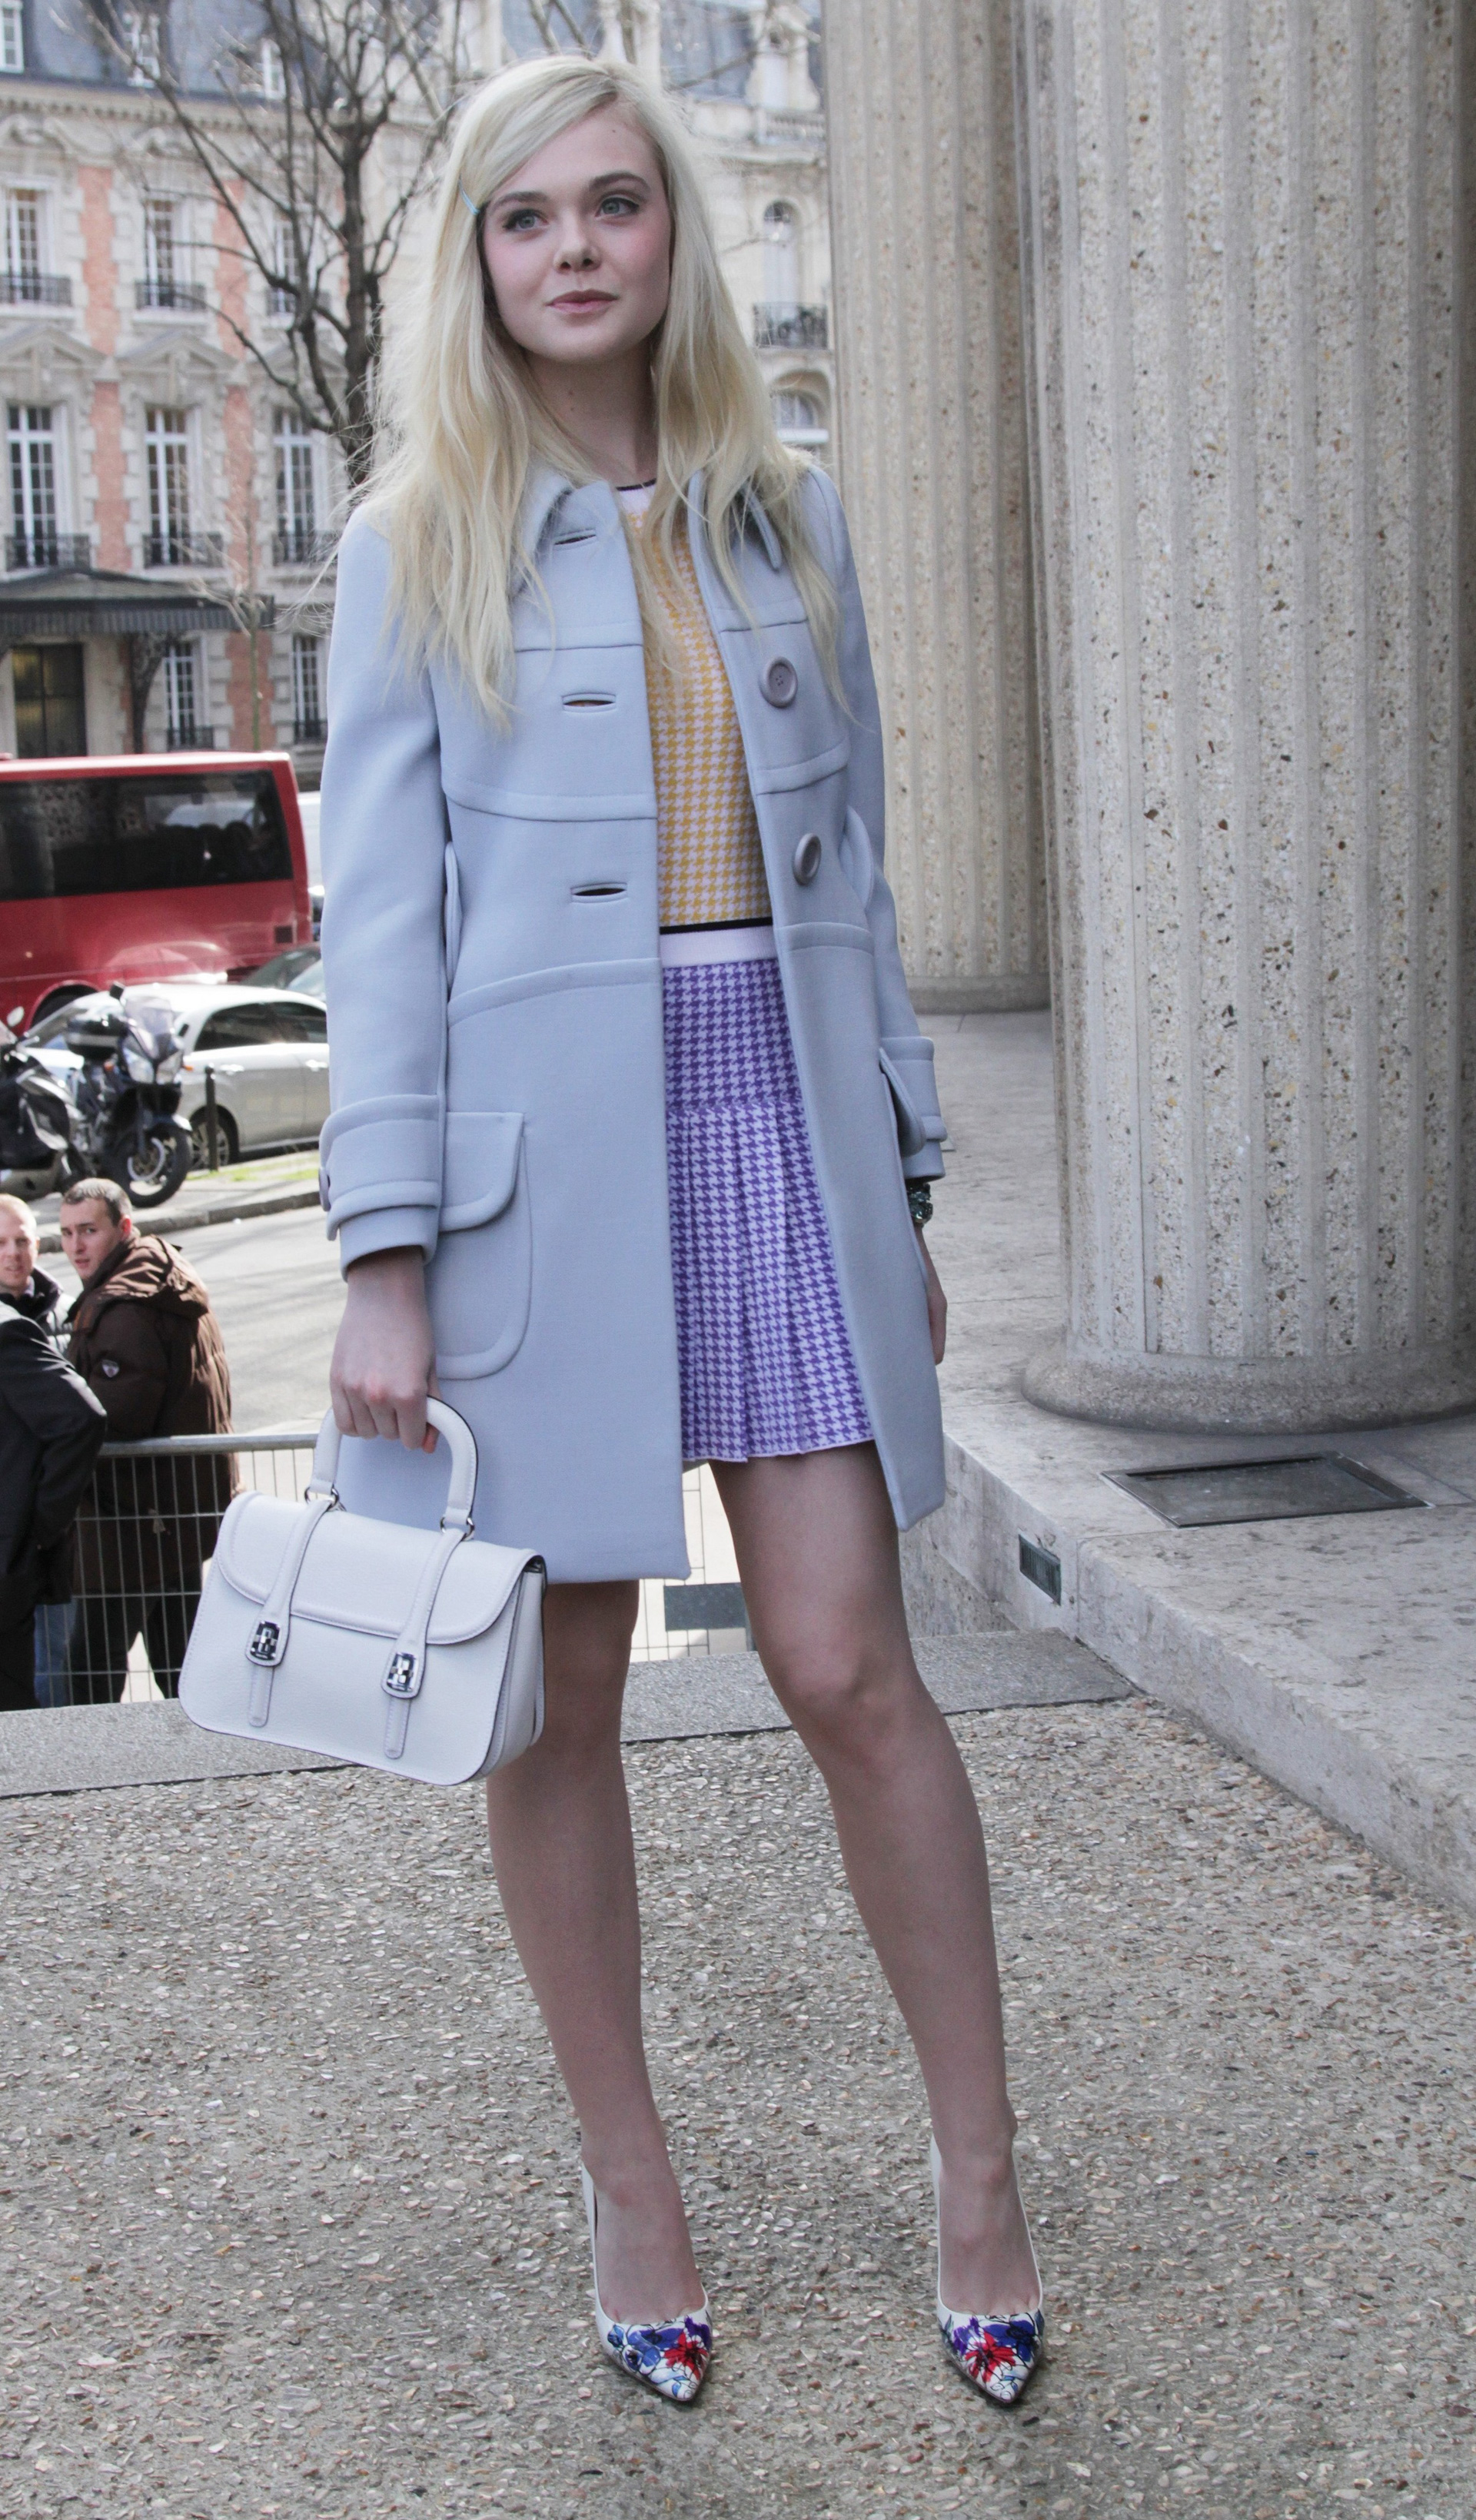 Elle Fanning wearing houndstooth dress